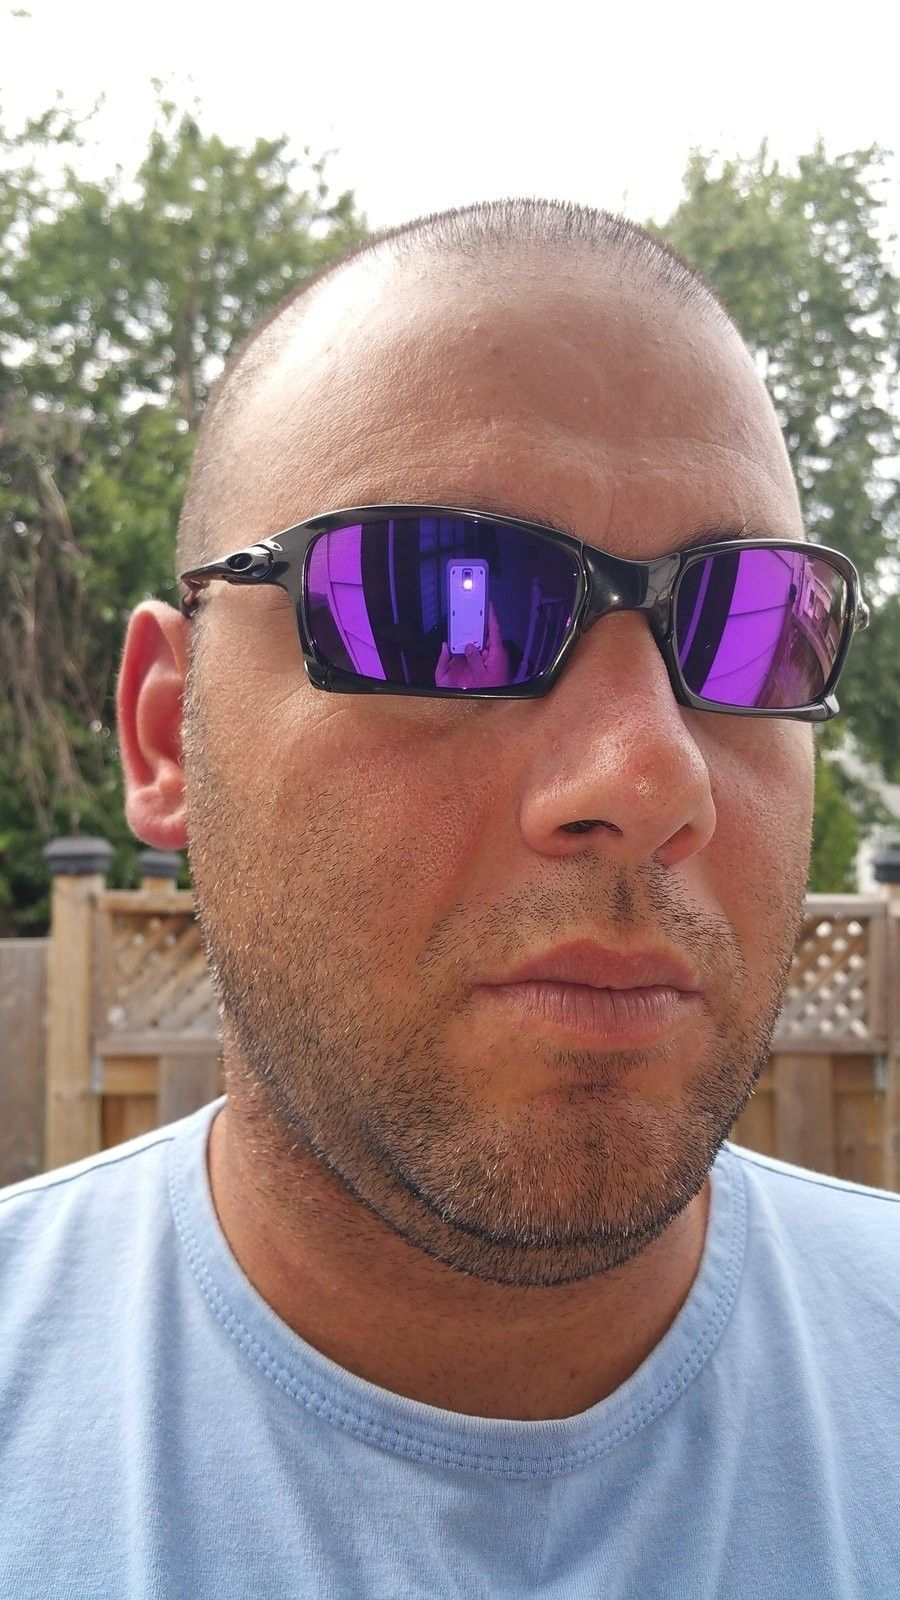 Polished Carbon X Squared Fuse Cosmic Lenses - 20150909_163327.jpg